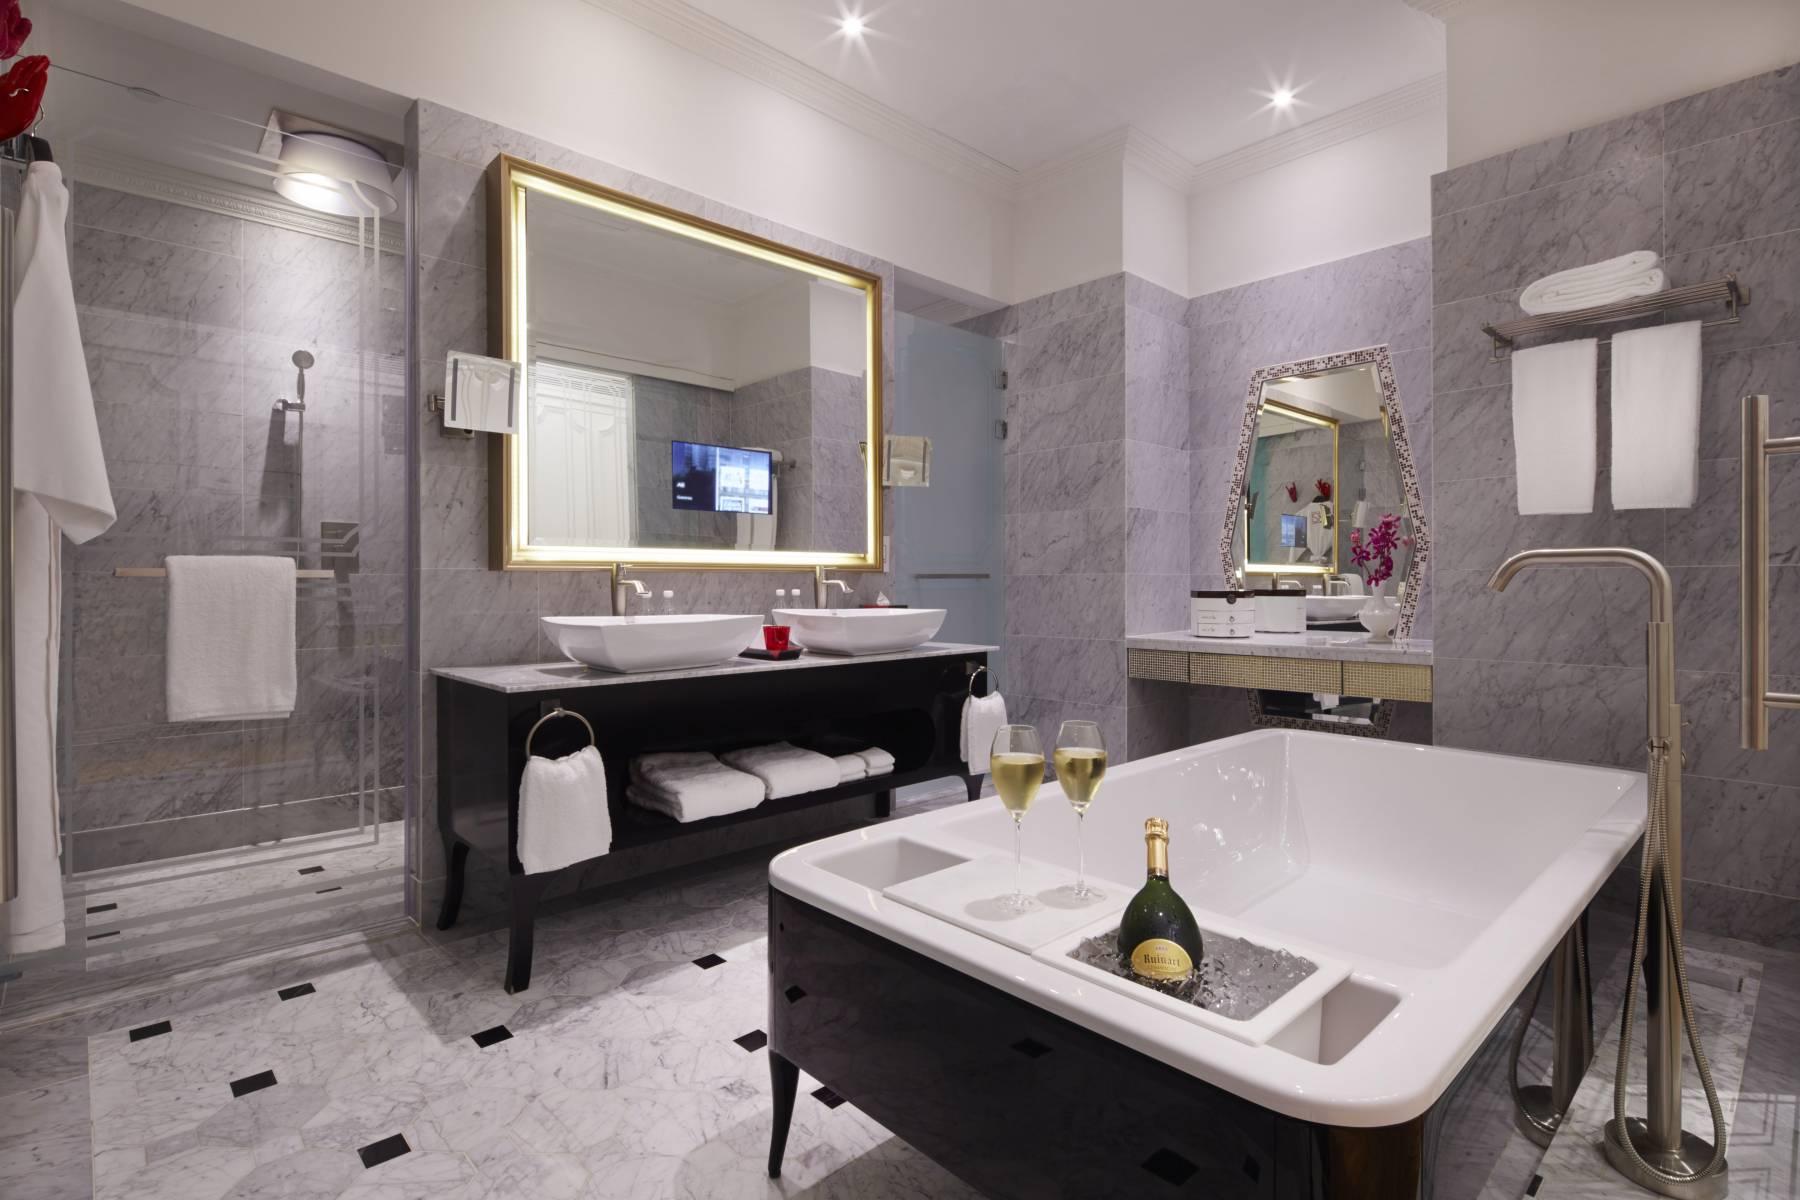 SO Sofitel Singapore - So Lofty bathroom on tiffany blue and gray bathroom, soft blue and gray bathroom, teal bathroom ideas, royal blue and gray bathroom, sky blue and gray bathroom, espresso and gray bathroom, gray and yellow bathroom, almond and gray bathroom, teal painted bathroom, teal colored bathrooms, black and white decor for a bathroom, purple and gray bathroom, white and gray bathroom, dark green and gray bathroom, silver blue and gray bathroom, powder blue and gray bathroom, teal bathroom cabinets, olive green and gray bathroom, black and gray bathroom, brown and gray bathroom,